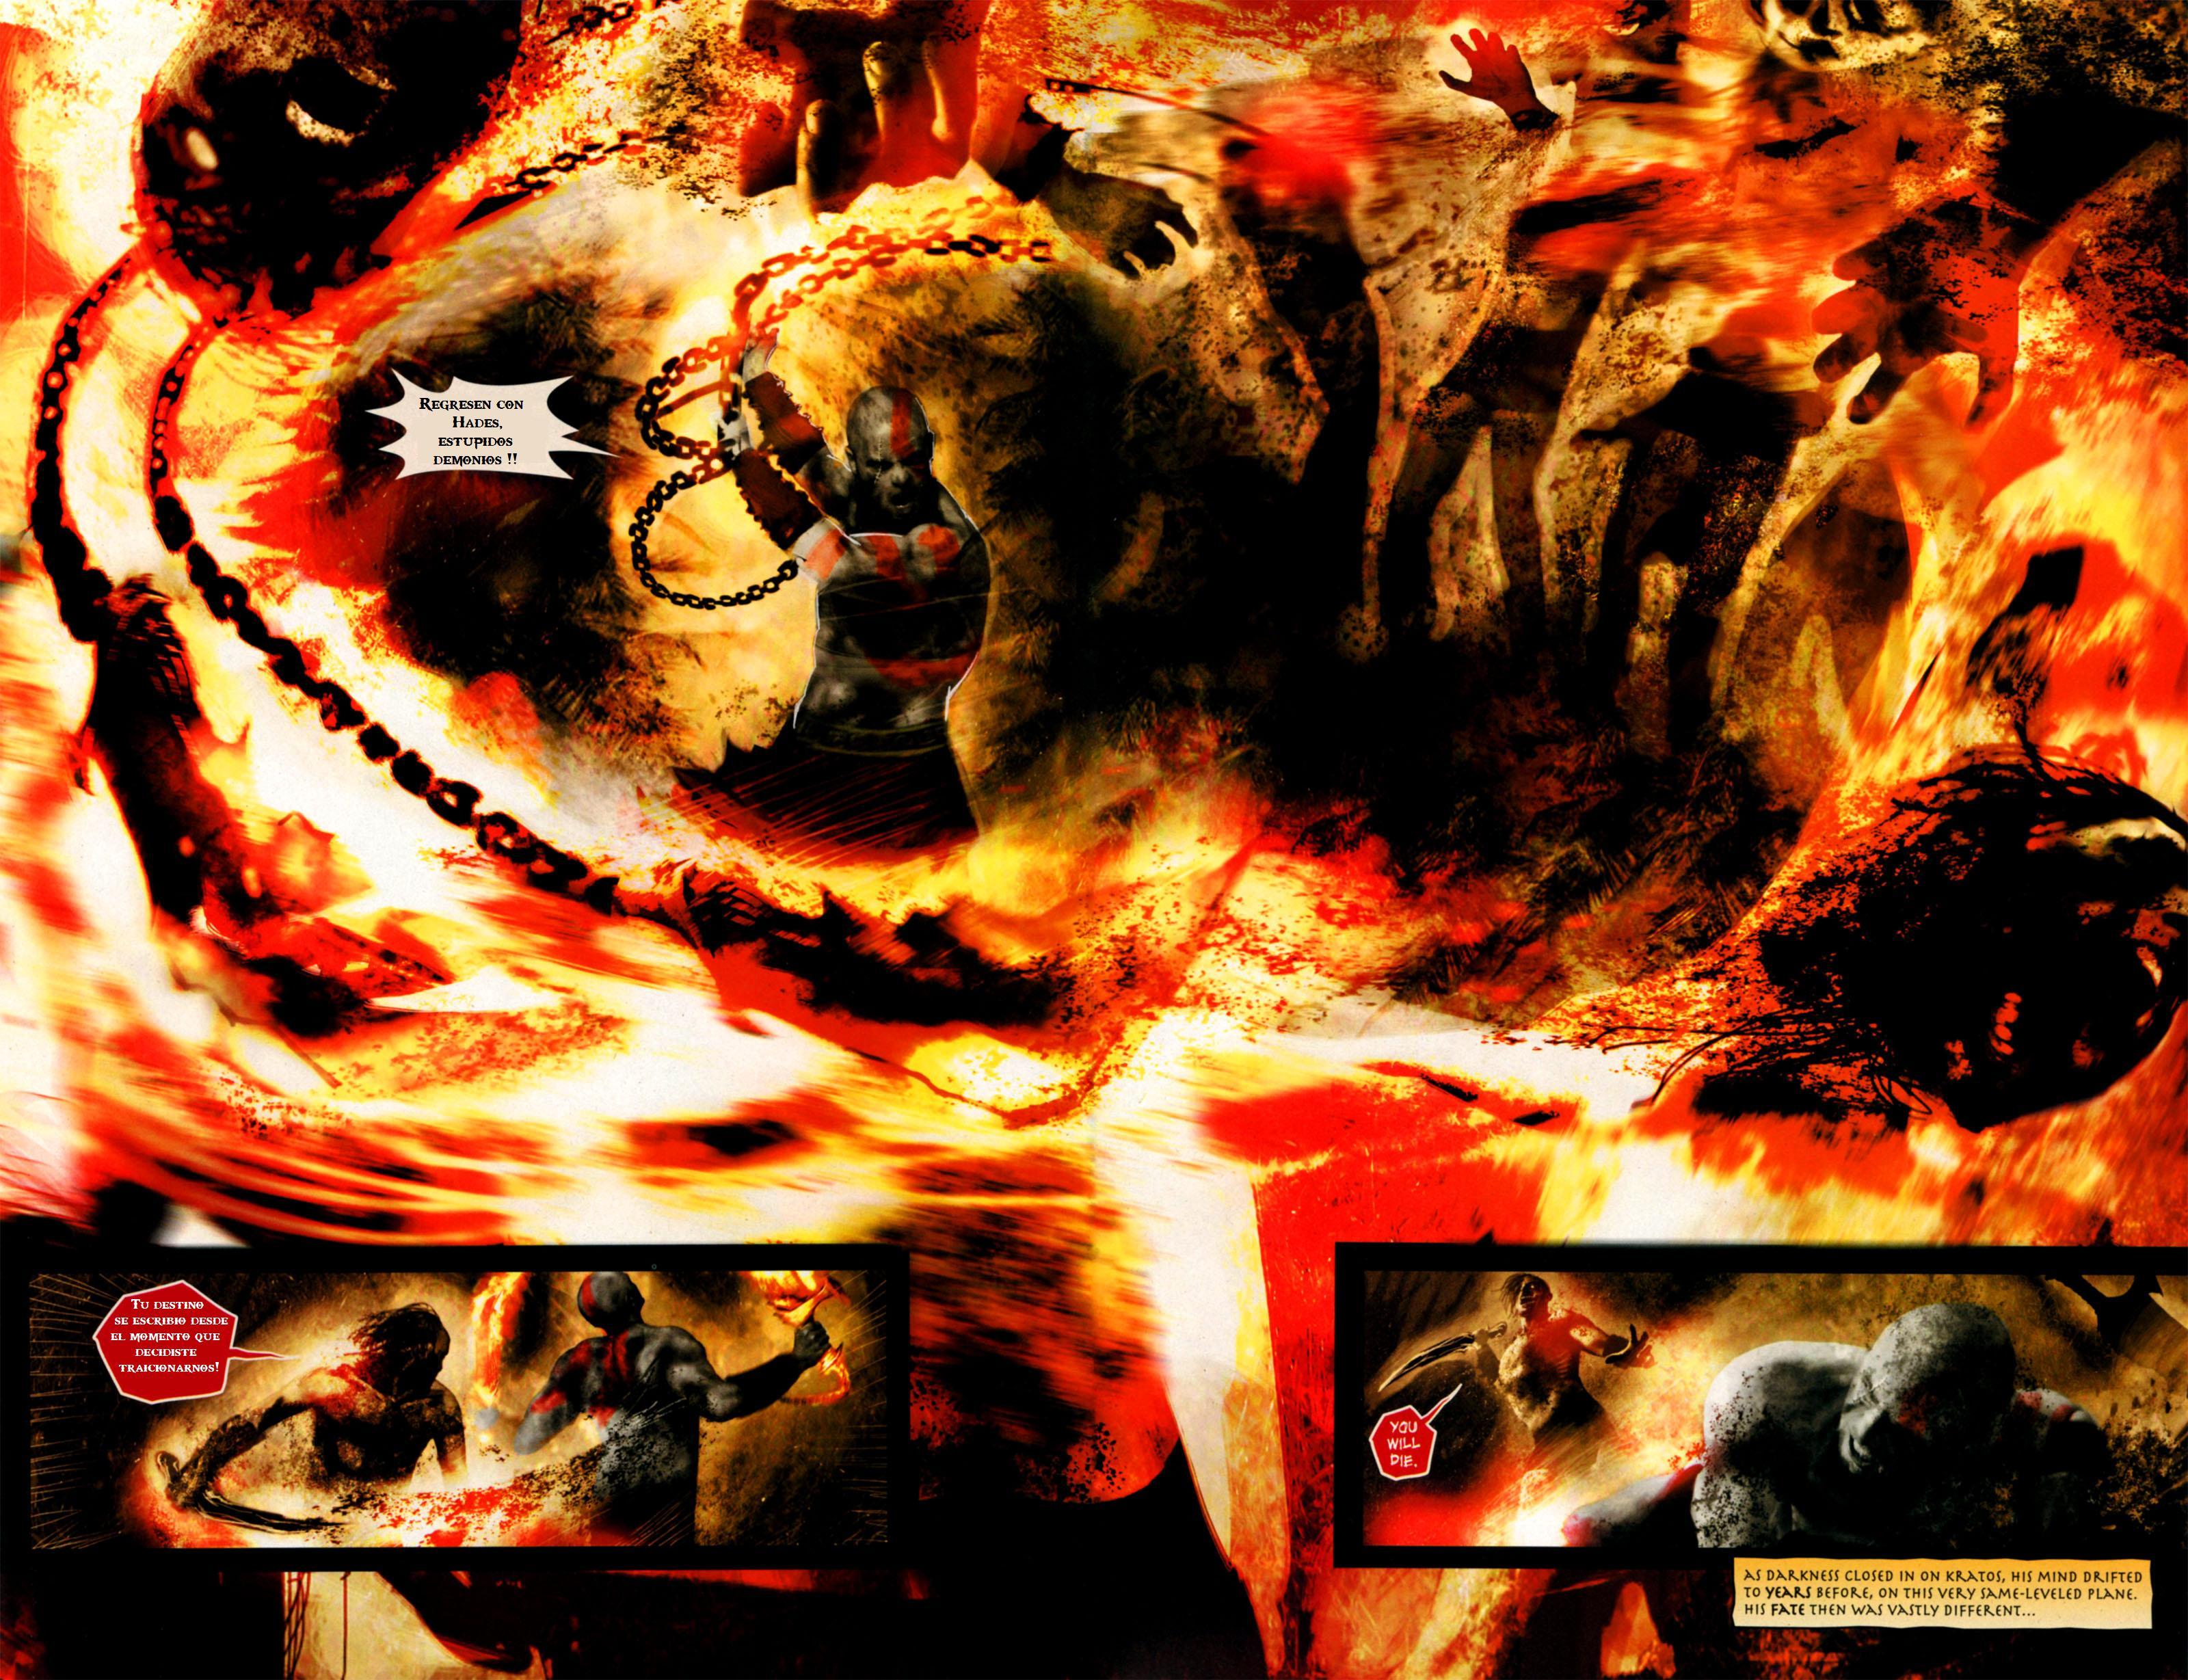 comic God of war volumen 4 » God Of War #4 (03)